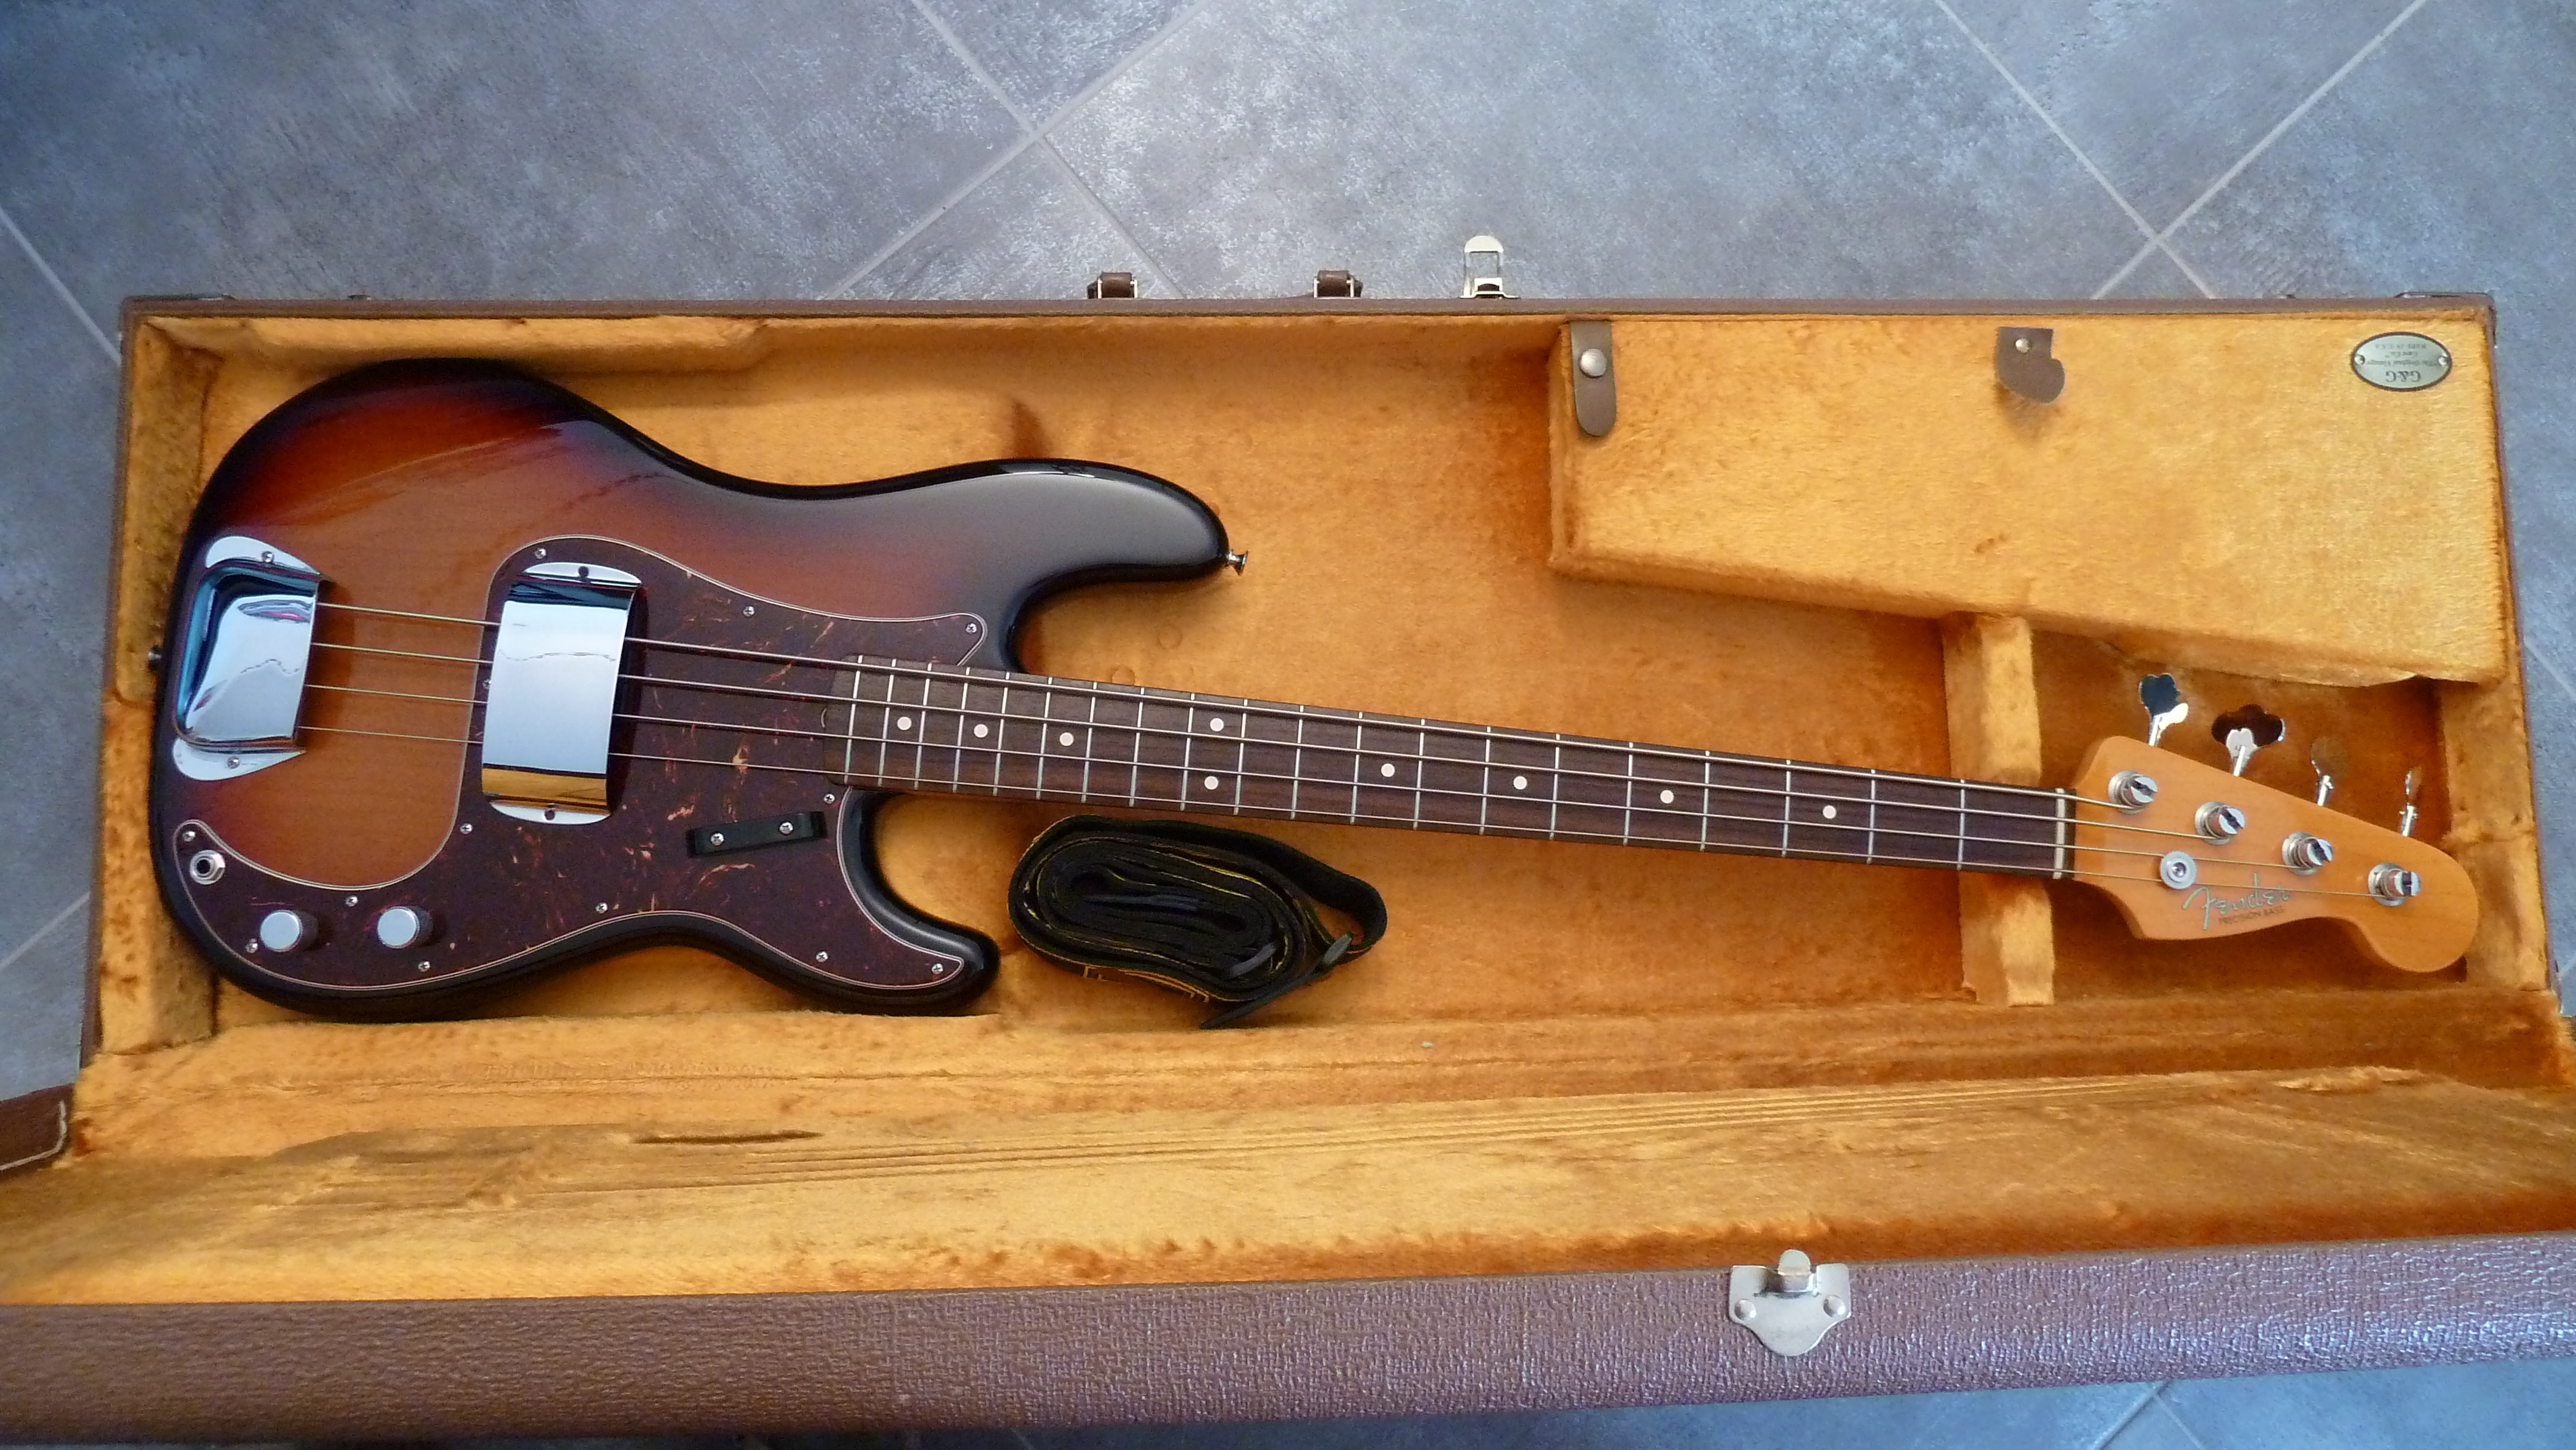 fender american vintage 39 62 precision bass image 864929 audiofanzine. Black Bedroom Furniture Sets. Home Design Ideas